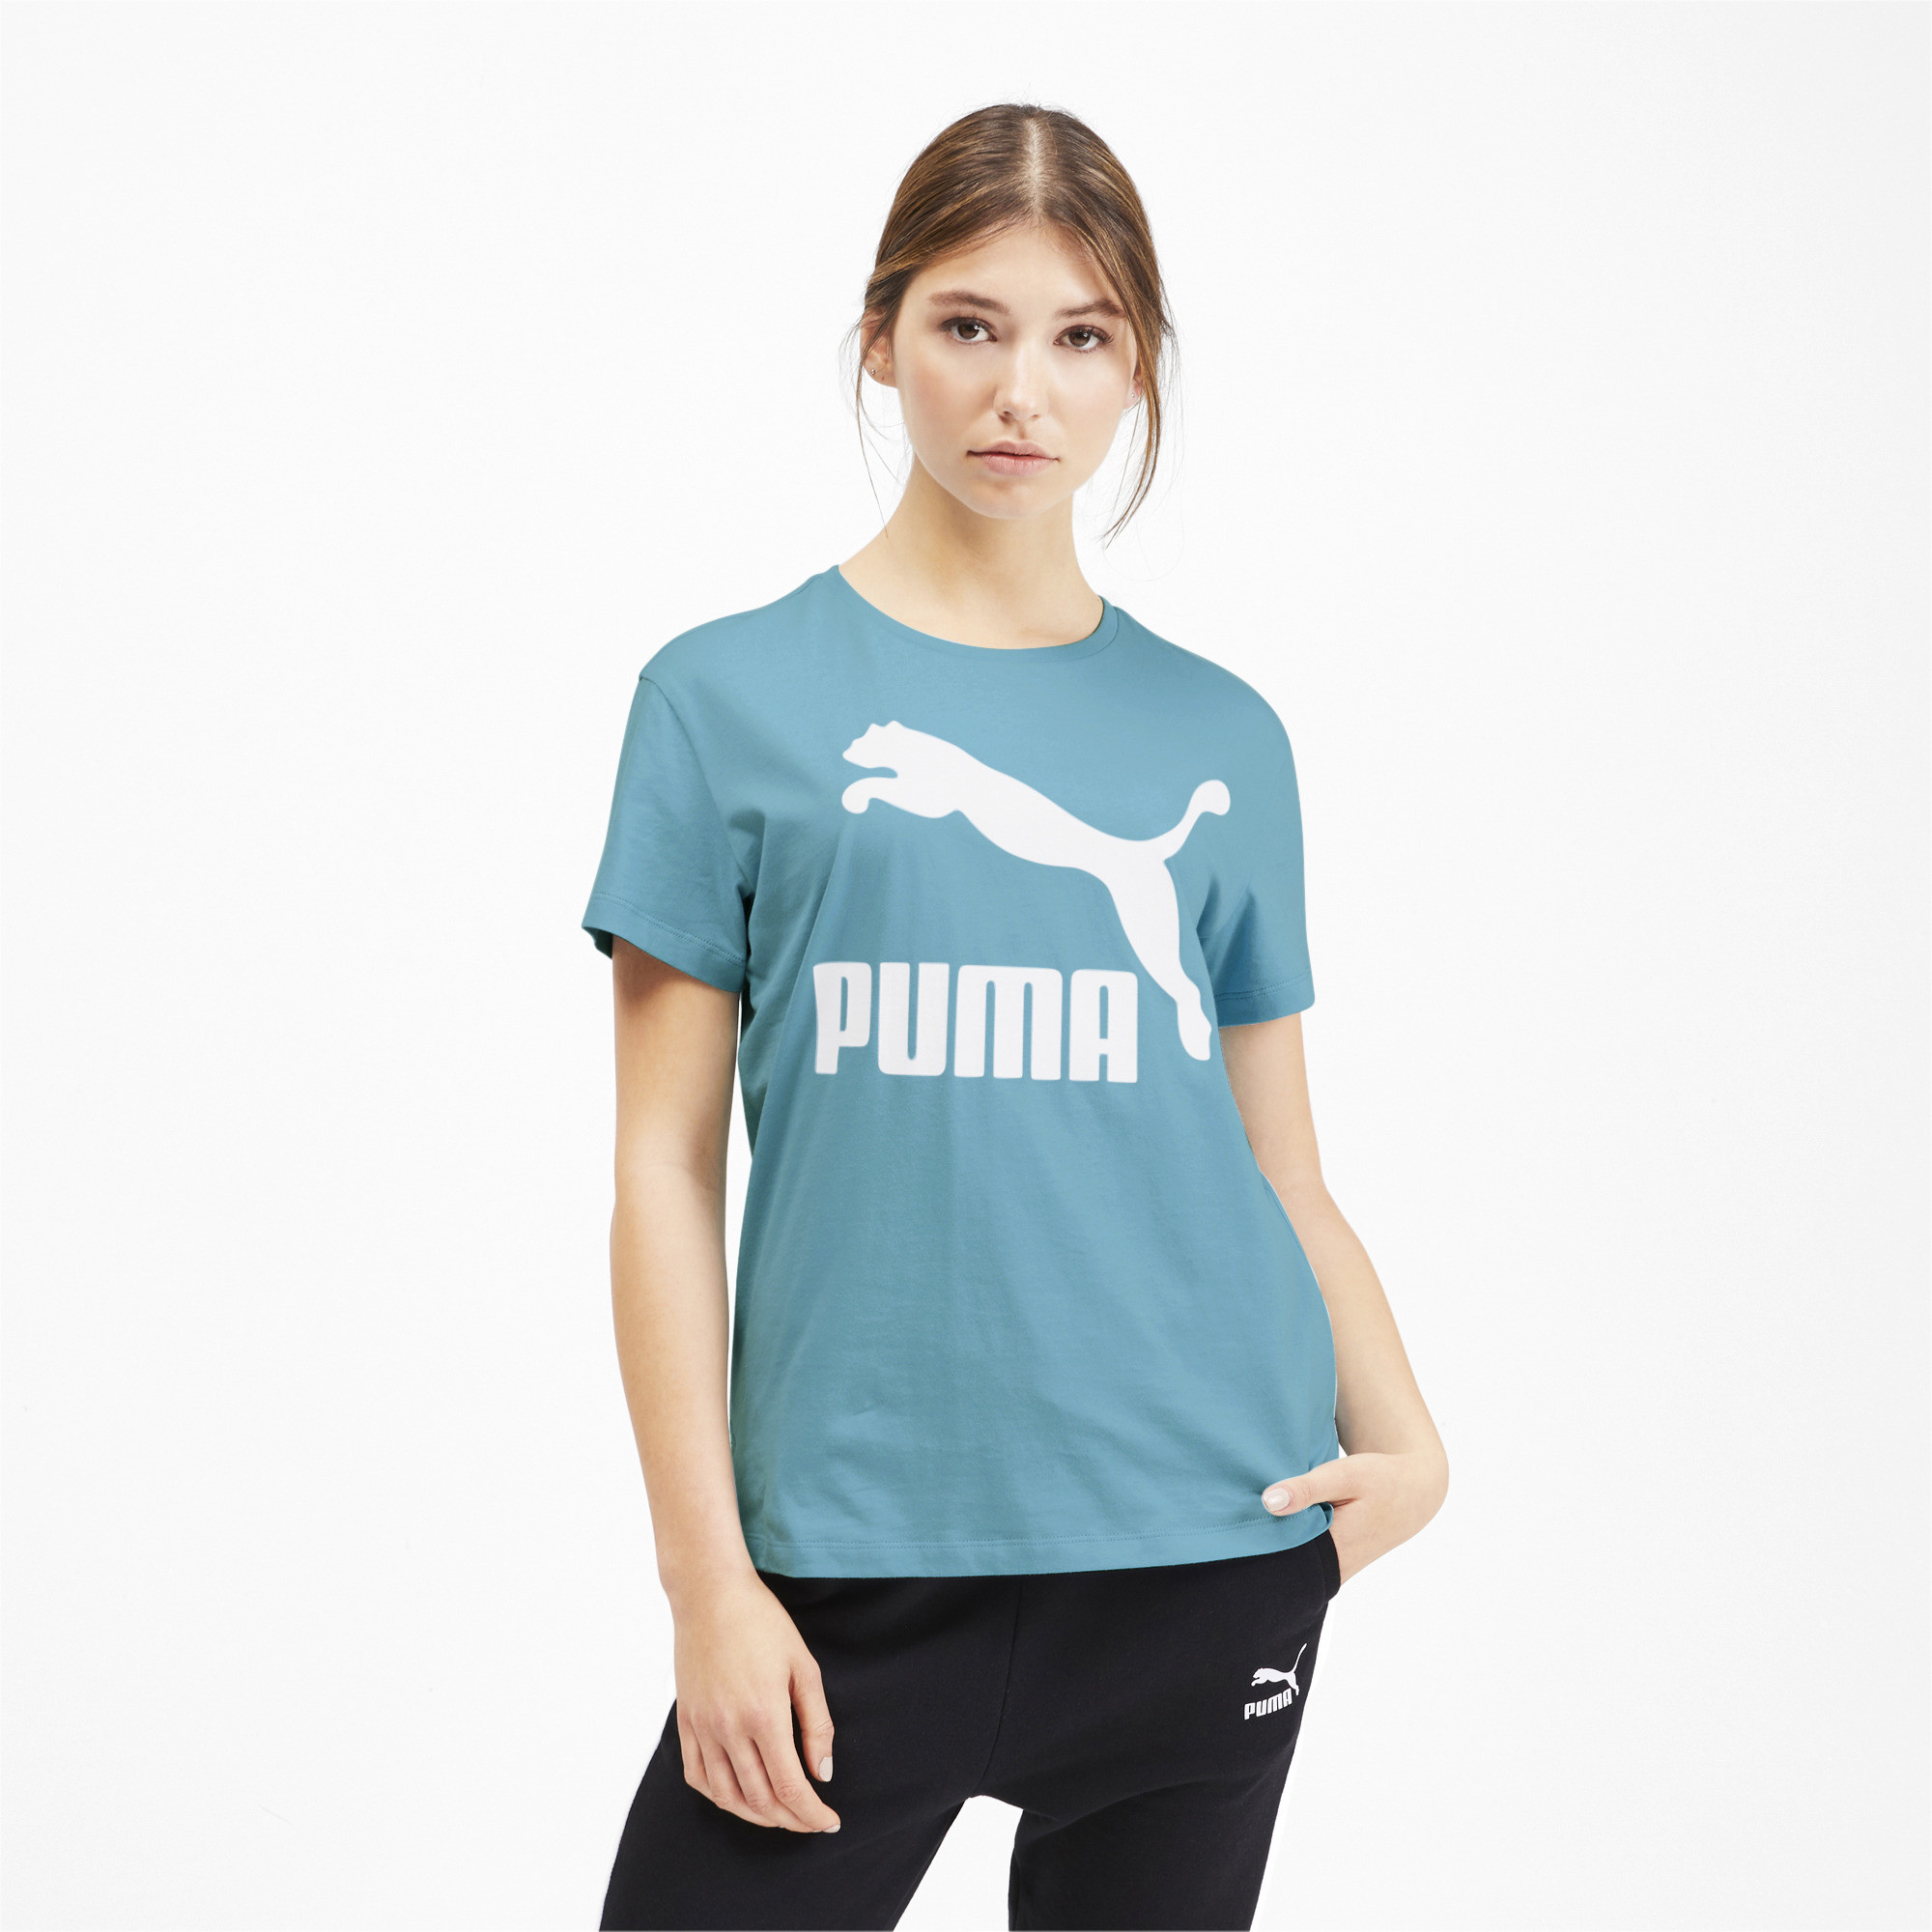 PUMA-Classics-Women-039-s-Logo-Tee-Women-Tee-Sport-Classics thumbnail 11